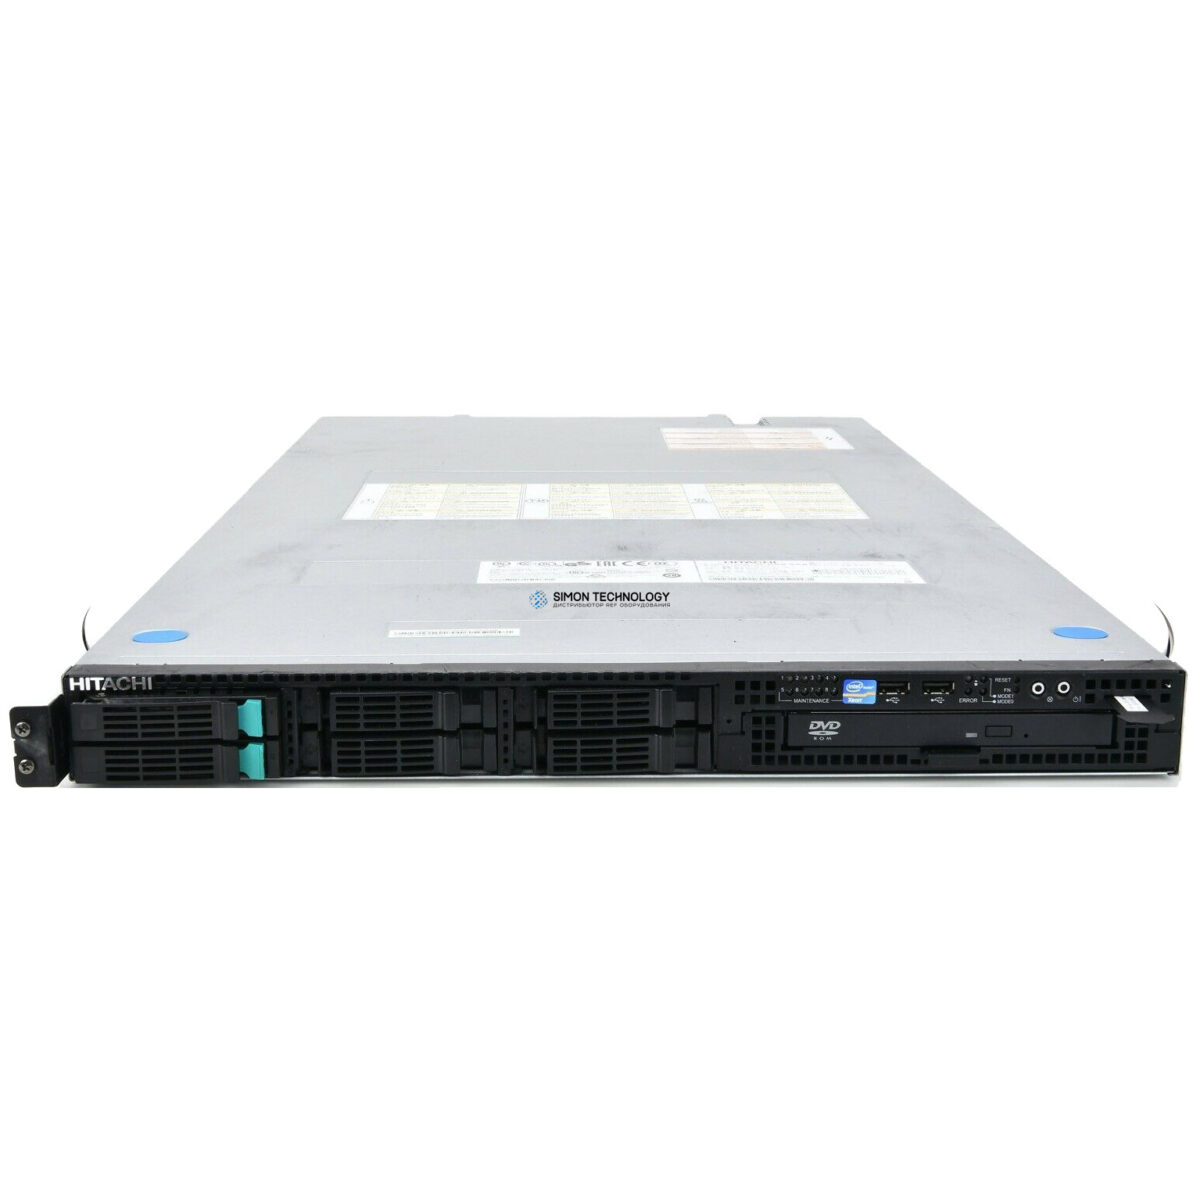 Сервер HDS Hitachi Compute Rack 210H Server 1x CPU, 16GB, raid controller, 1x 8GB Dual fiber adapter, 2x 300GB diske, dual PSU, rackmount (GQ-CR210HM-NDN-Y)